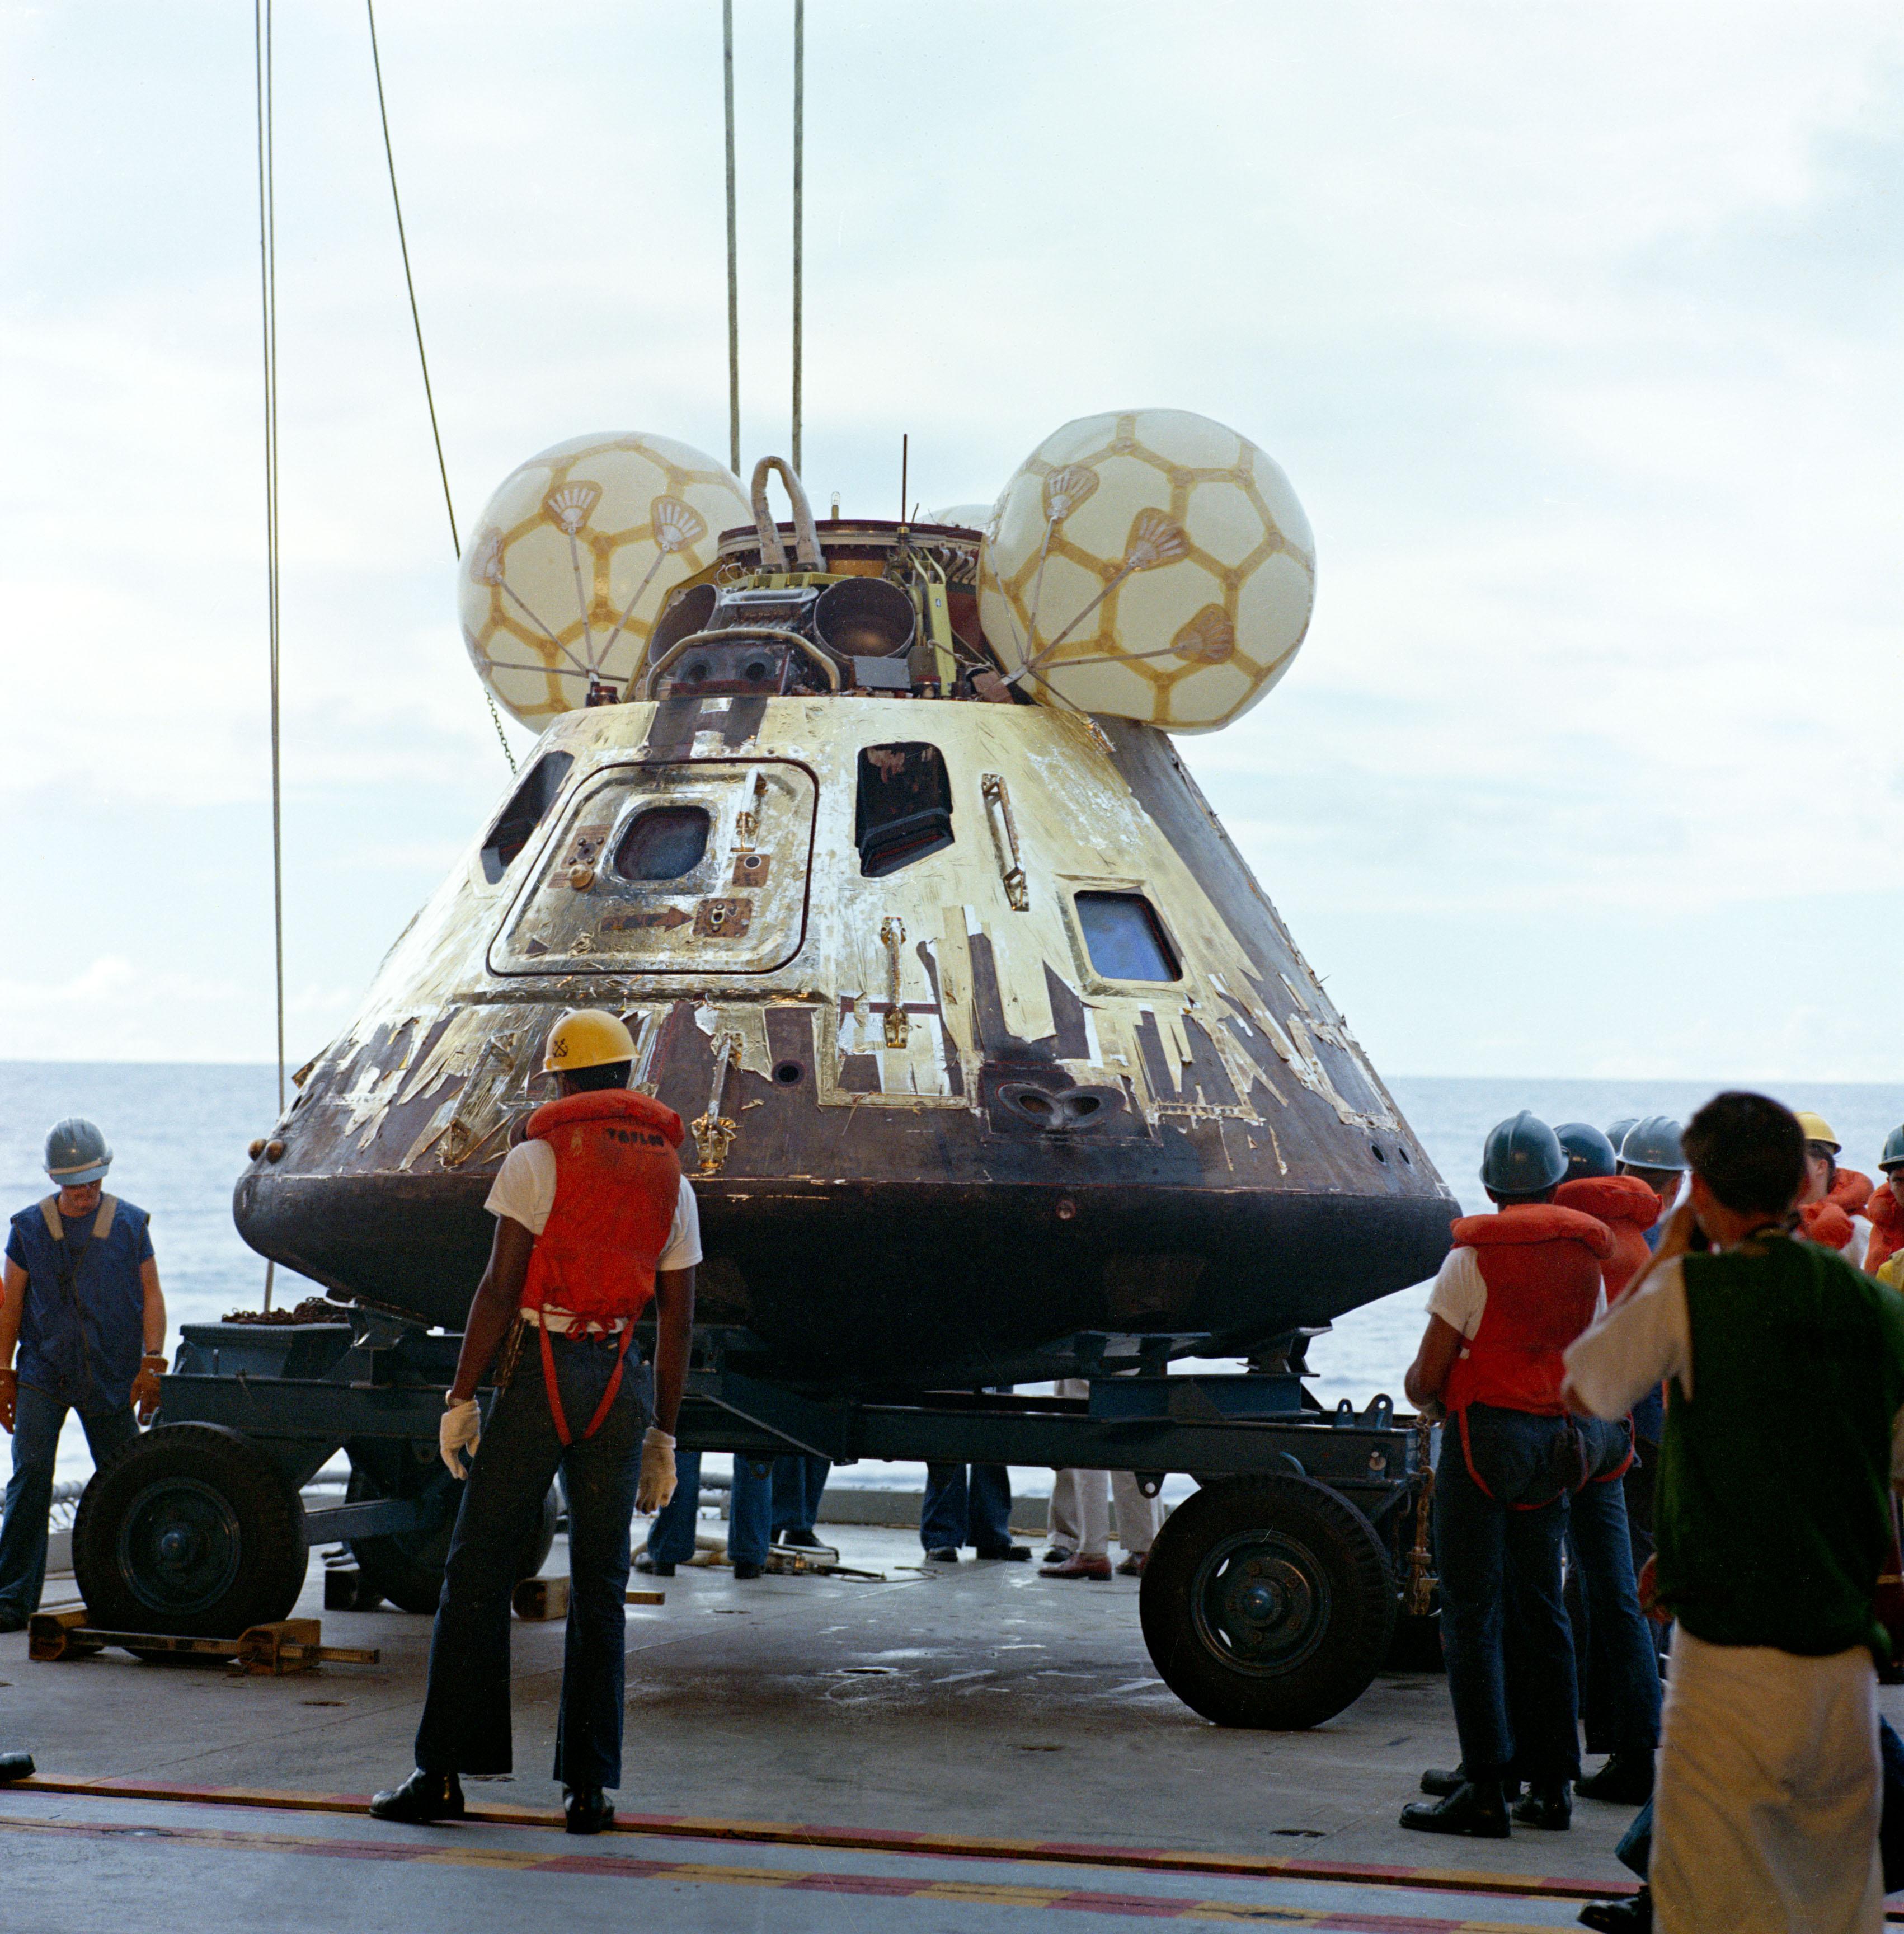 File:Apollo13 csm recovery.jpg - Wikimedia Commons